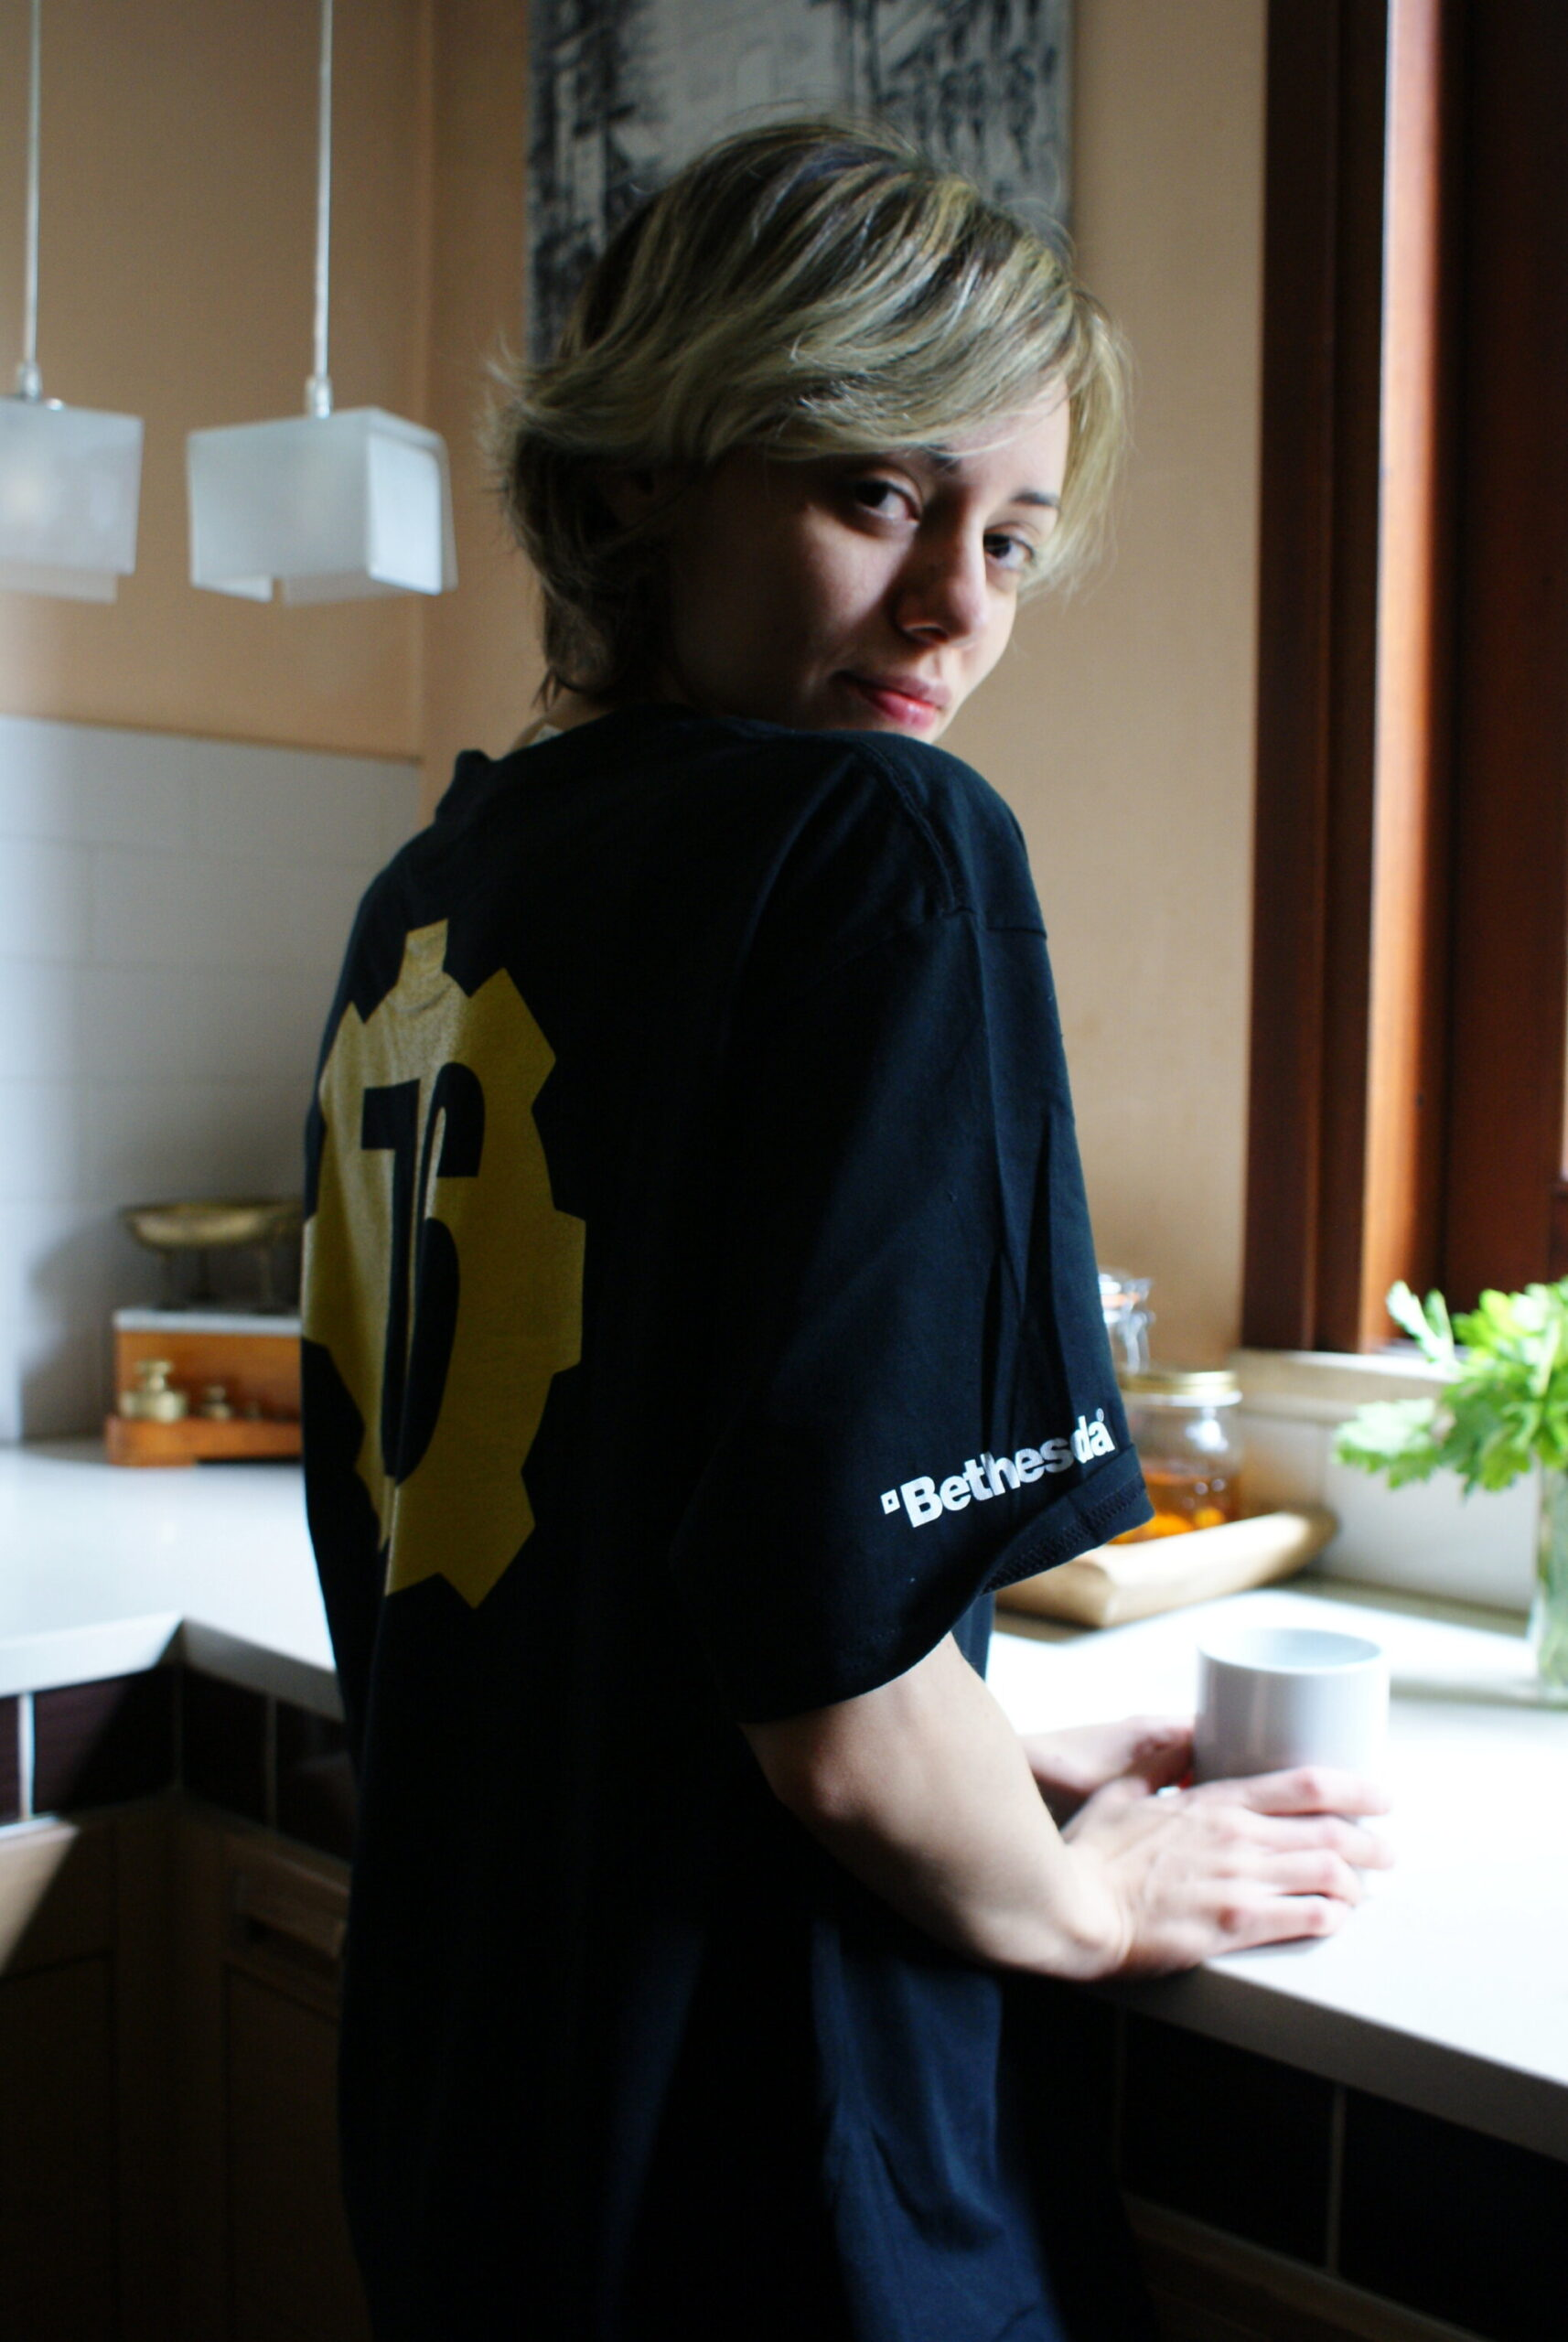 bethesda fallout76 model girl italian elisa blogger